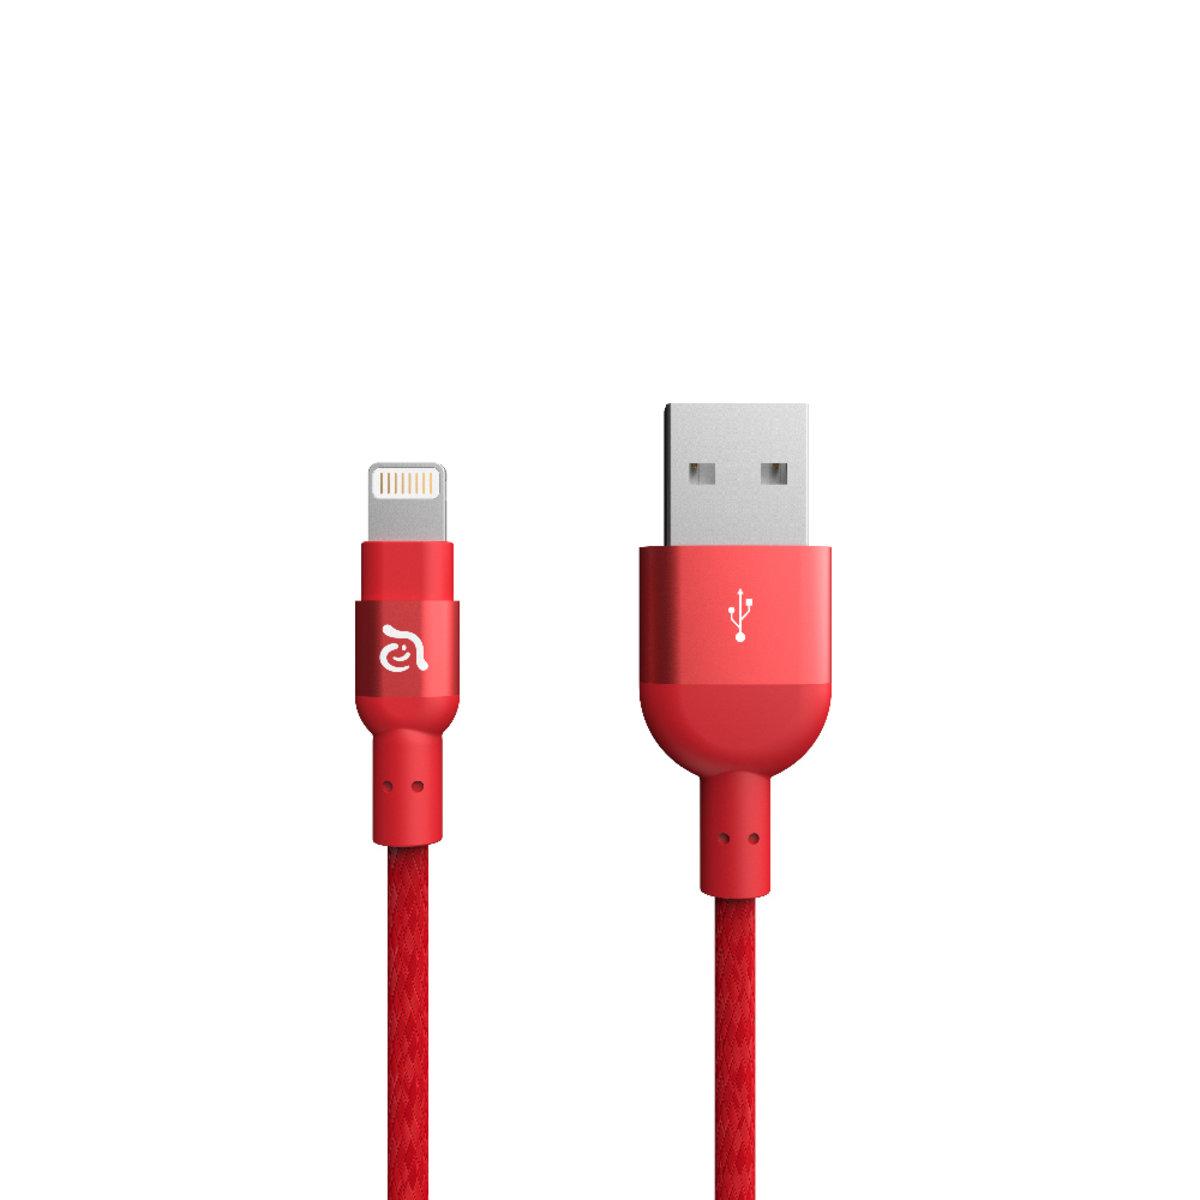 Adam Elements Peak Ii 20b Lightning Cable Red Hktvmall Online Element Iklips Duo Apple Flash Drive 128gb Shopping